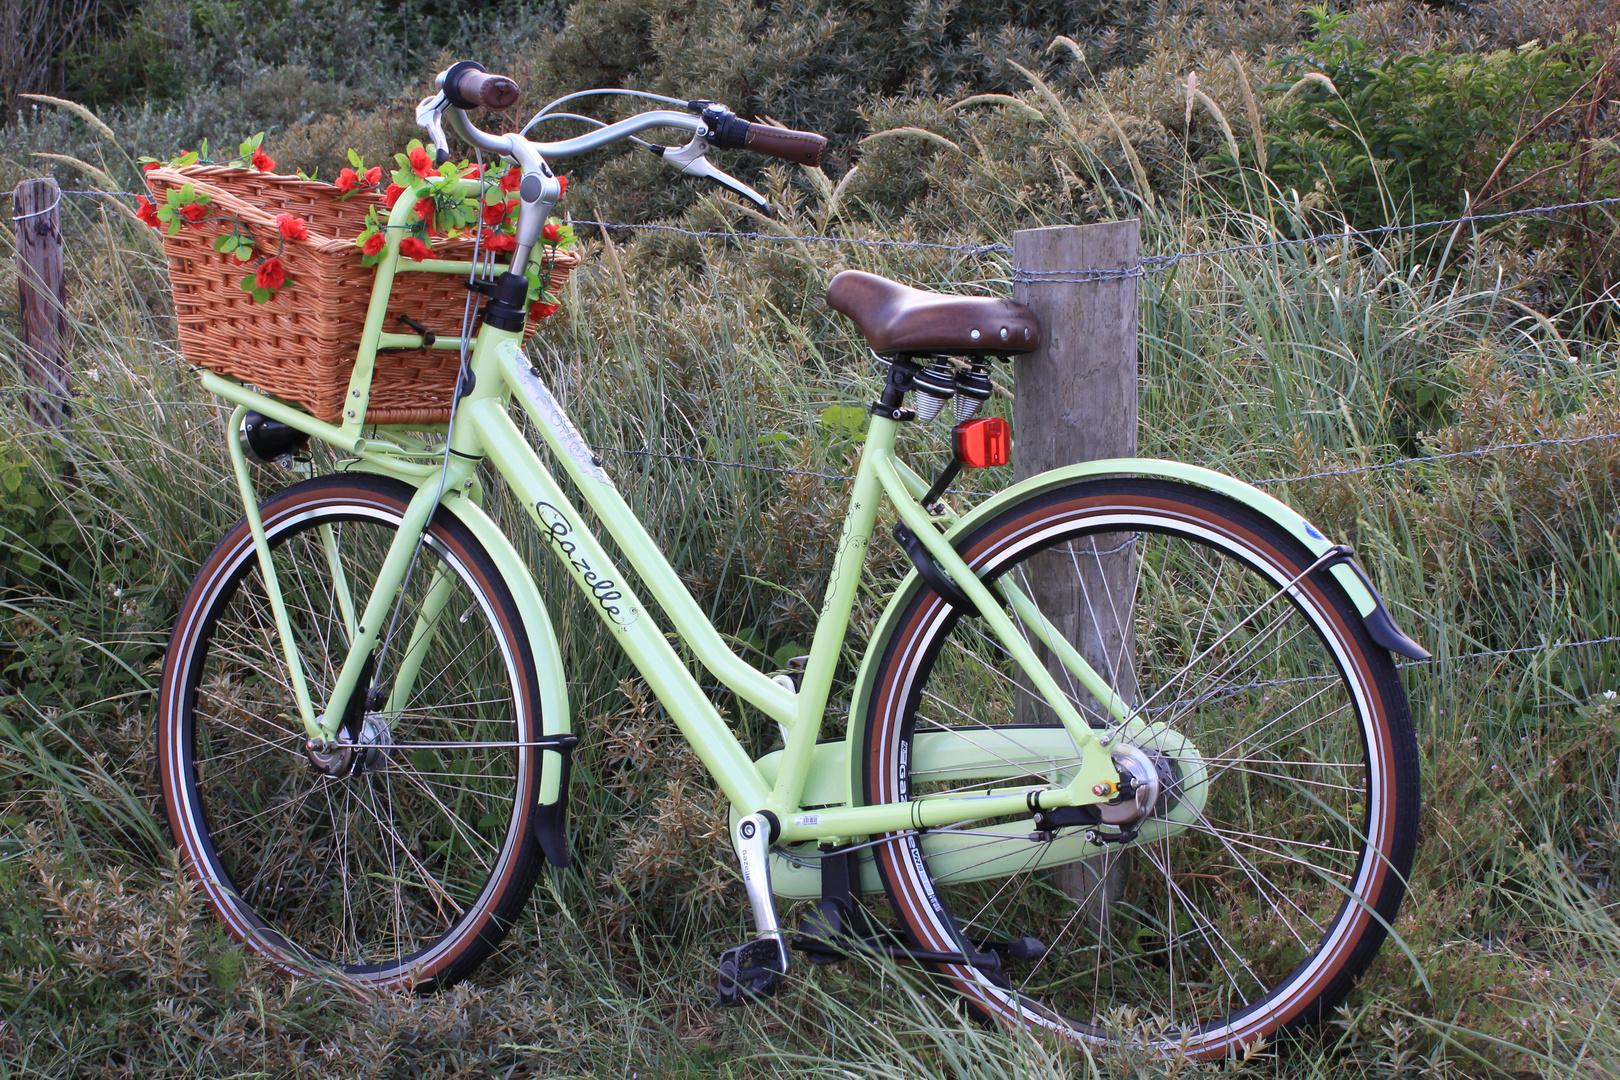 Mit dem Rad zum Strand